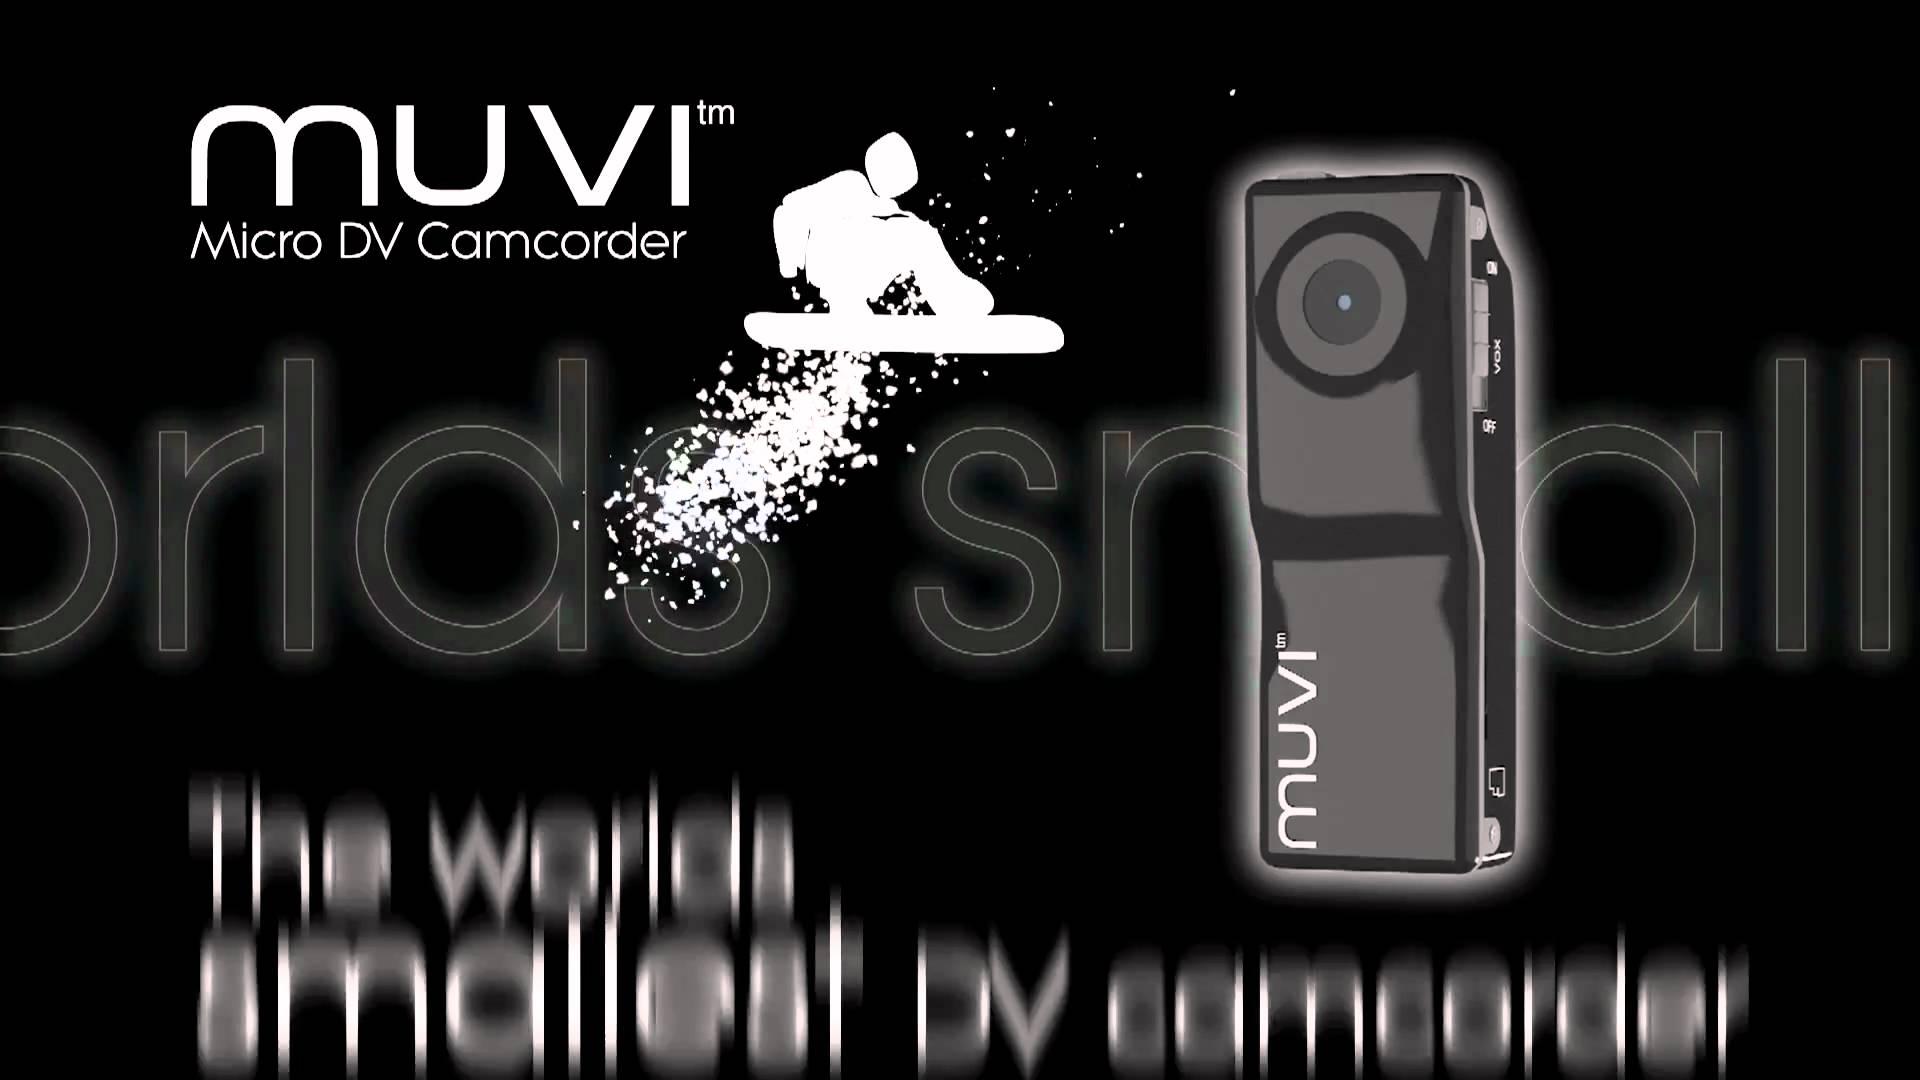 Veho VCC-003 Muvi Micro Camcorder Promo Video